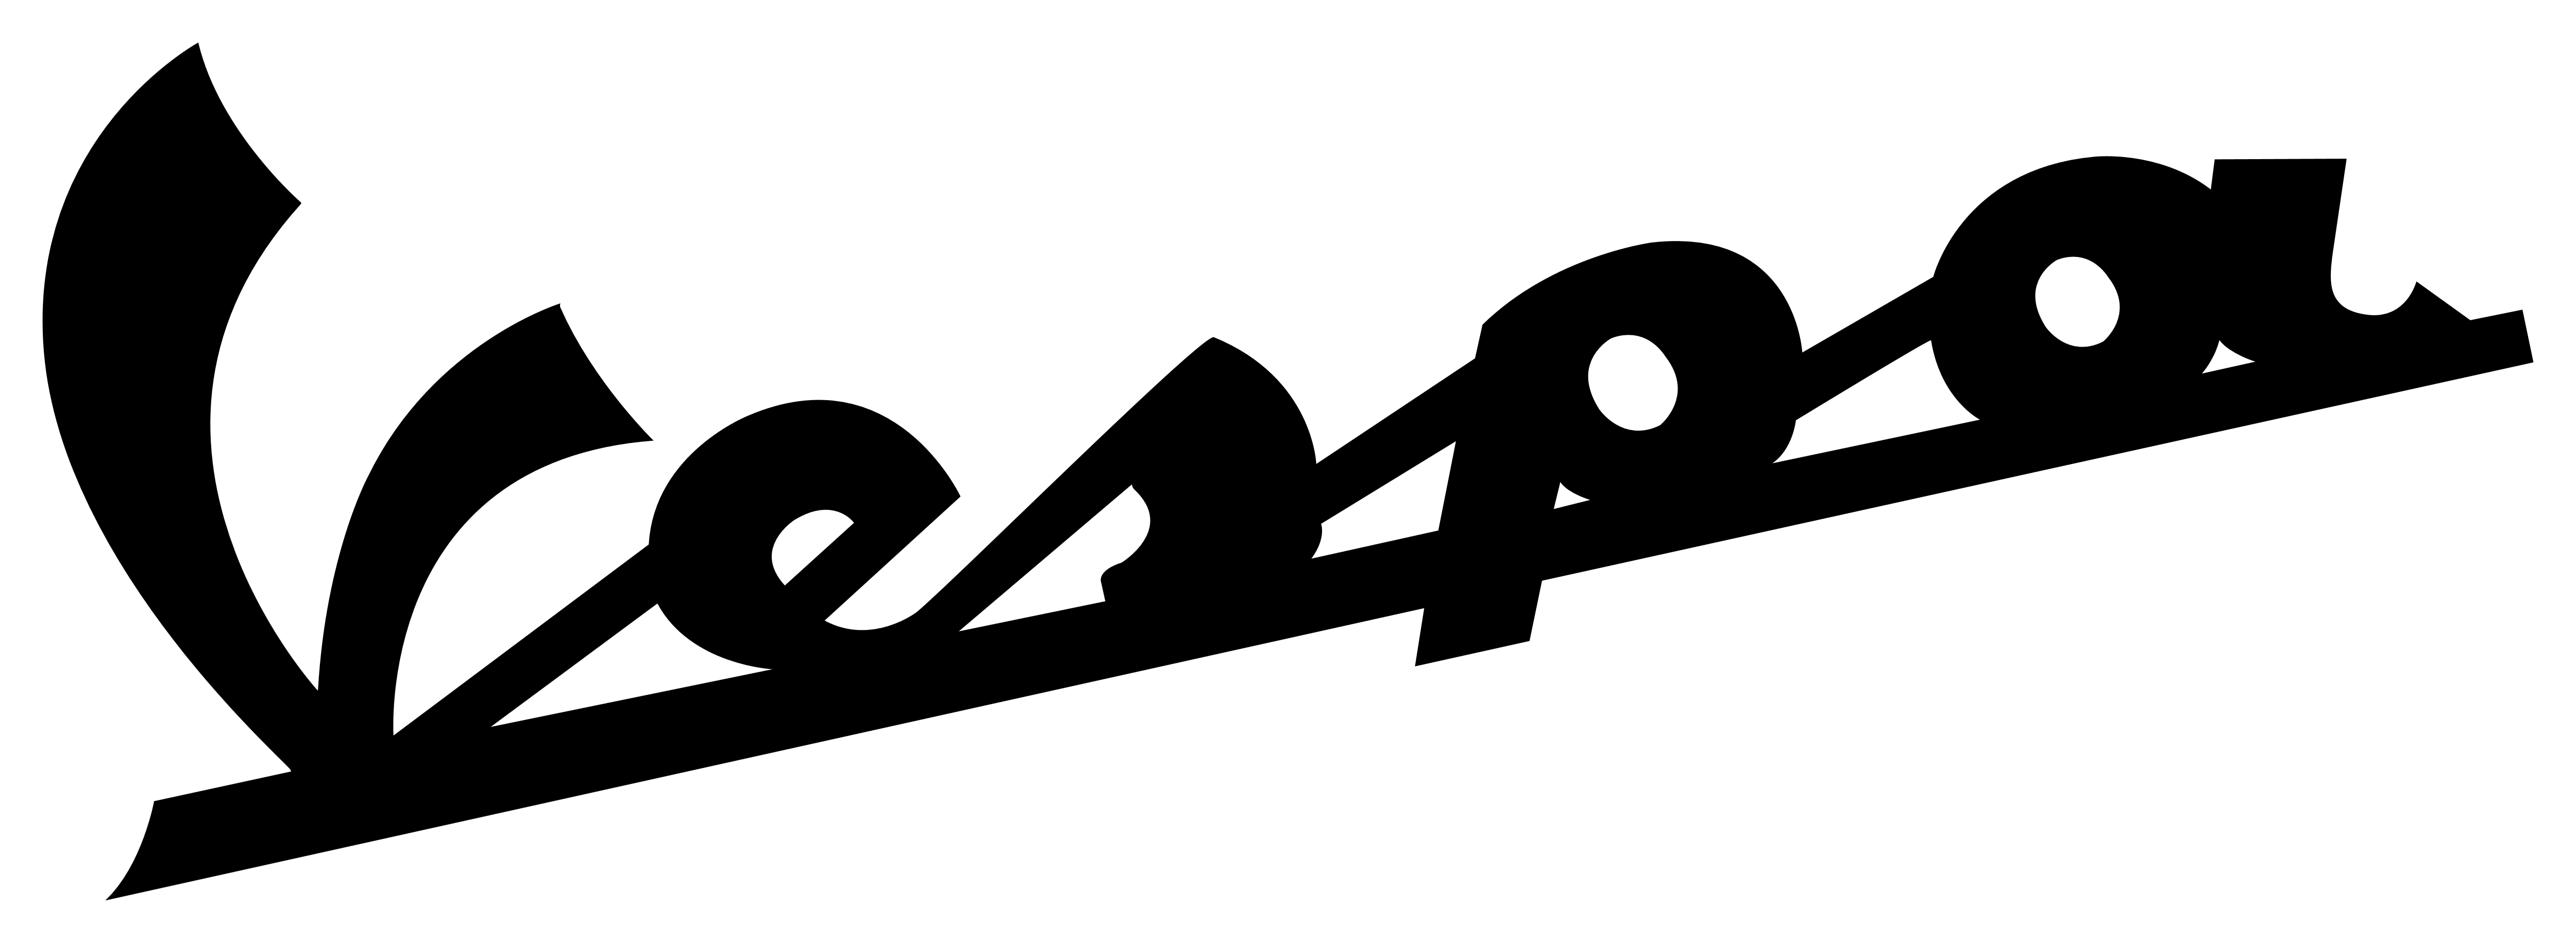 Logo black png pinterest. Scooter clipart vespa italian